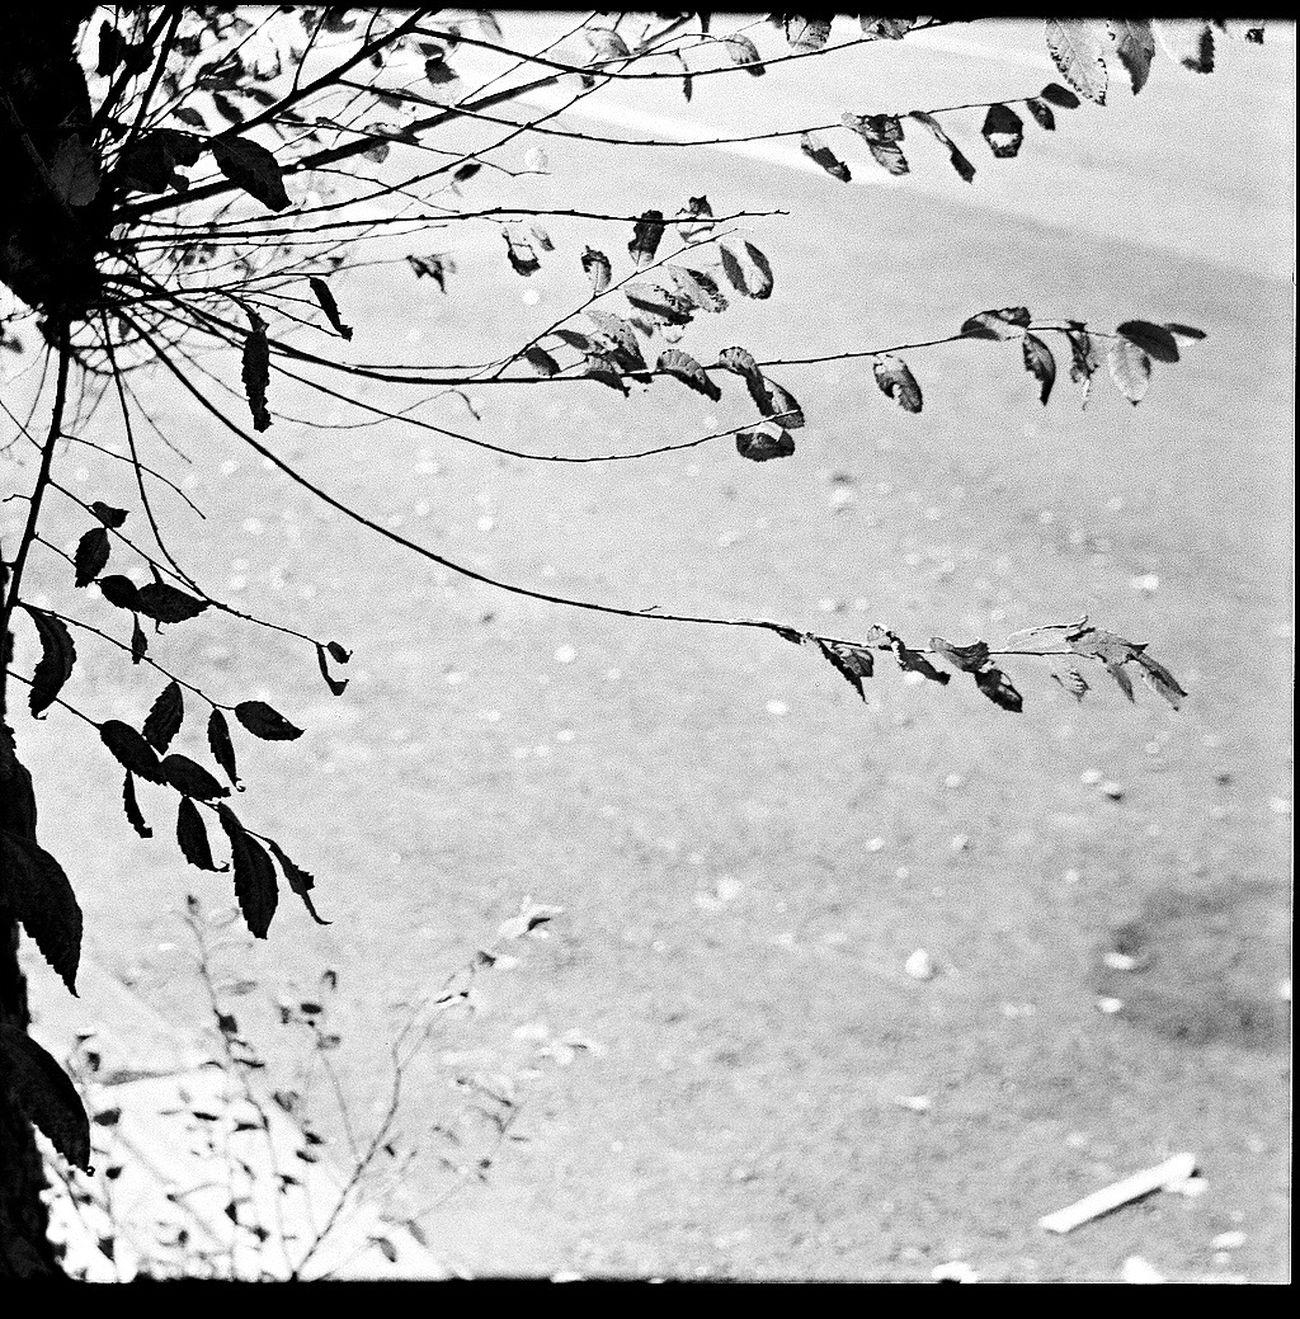 Film Plant Leaf Belair Panorama Koduckgirl 6x6 Square Blk N Wht Shadow